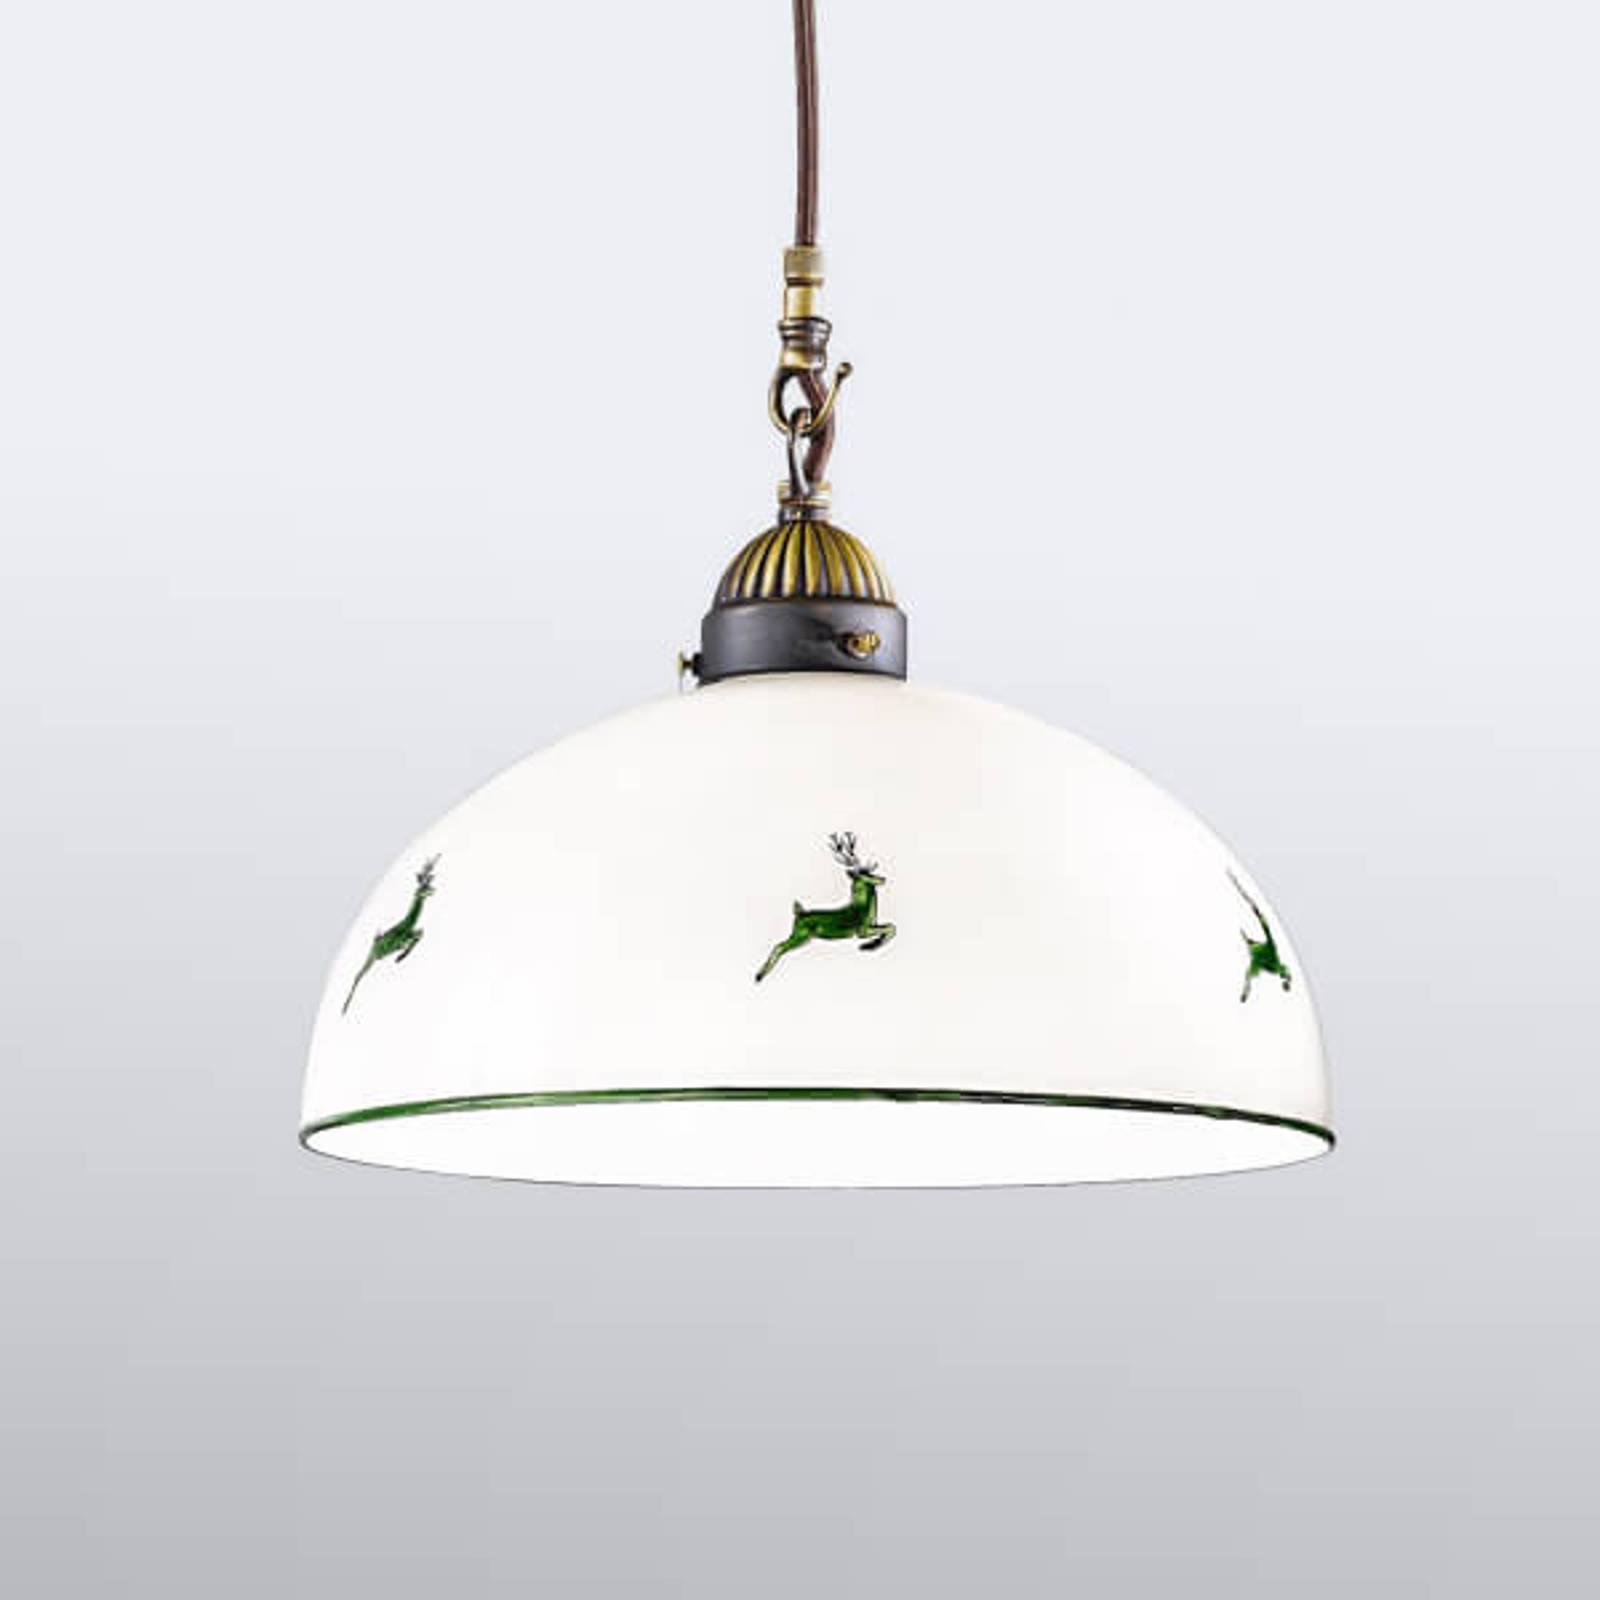 Czarująca lampa wisząca Nonna 30 cm